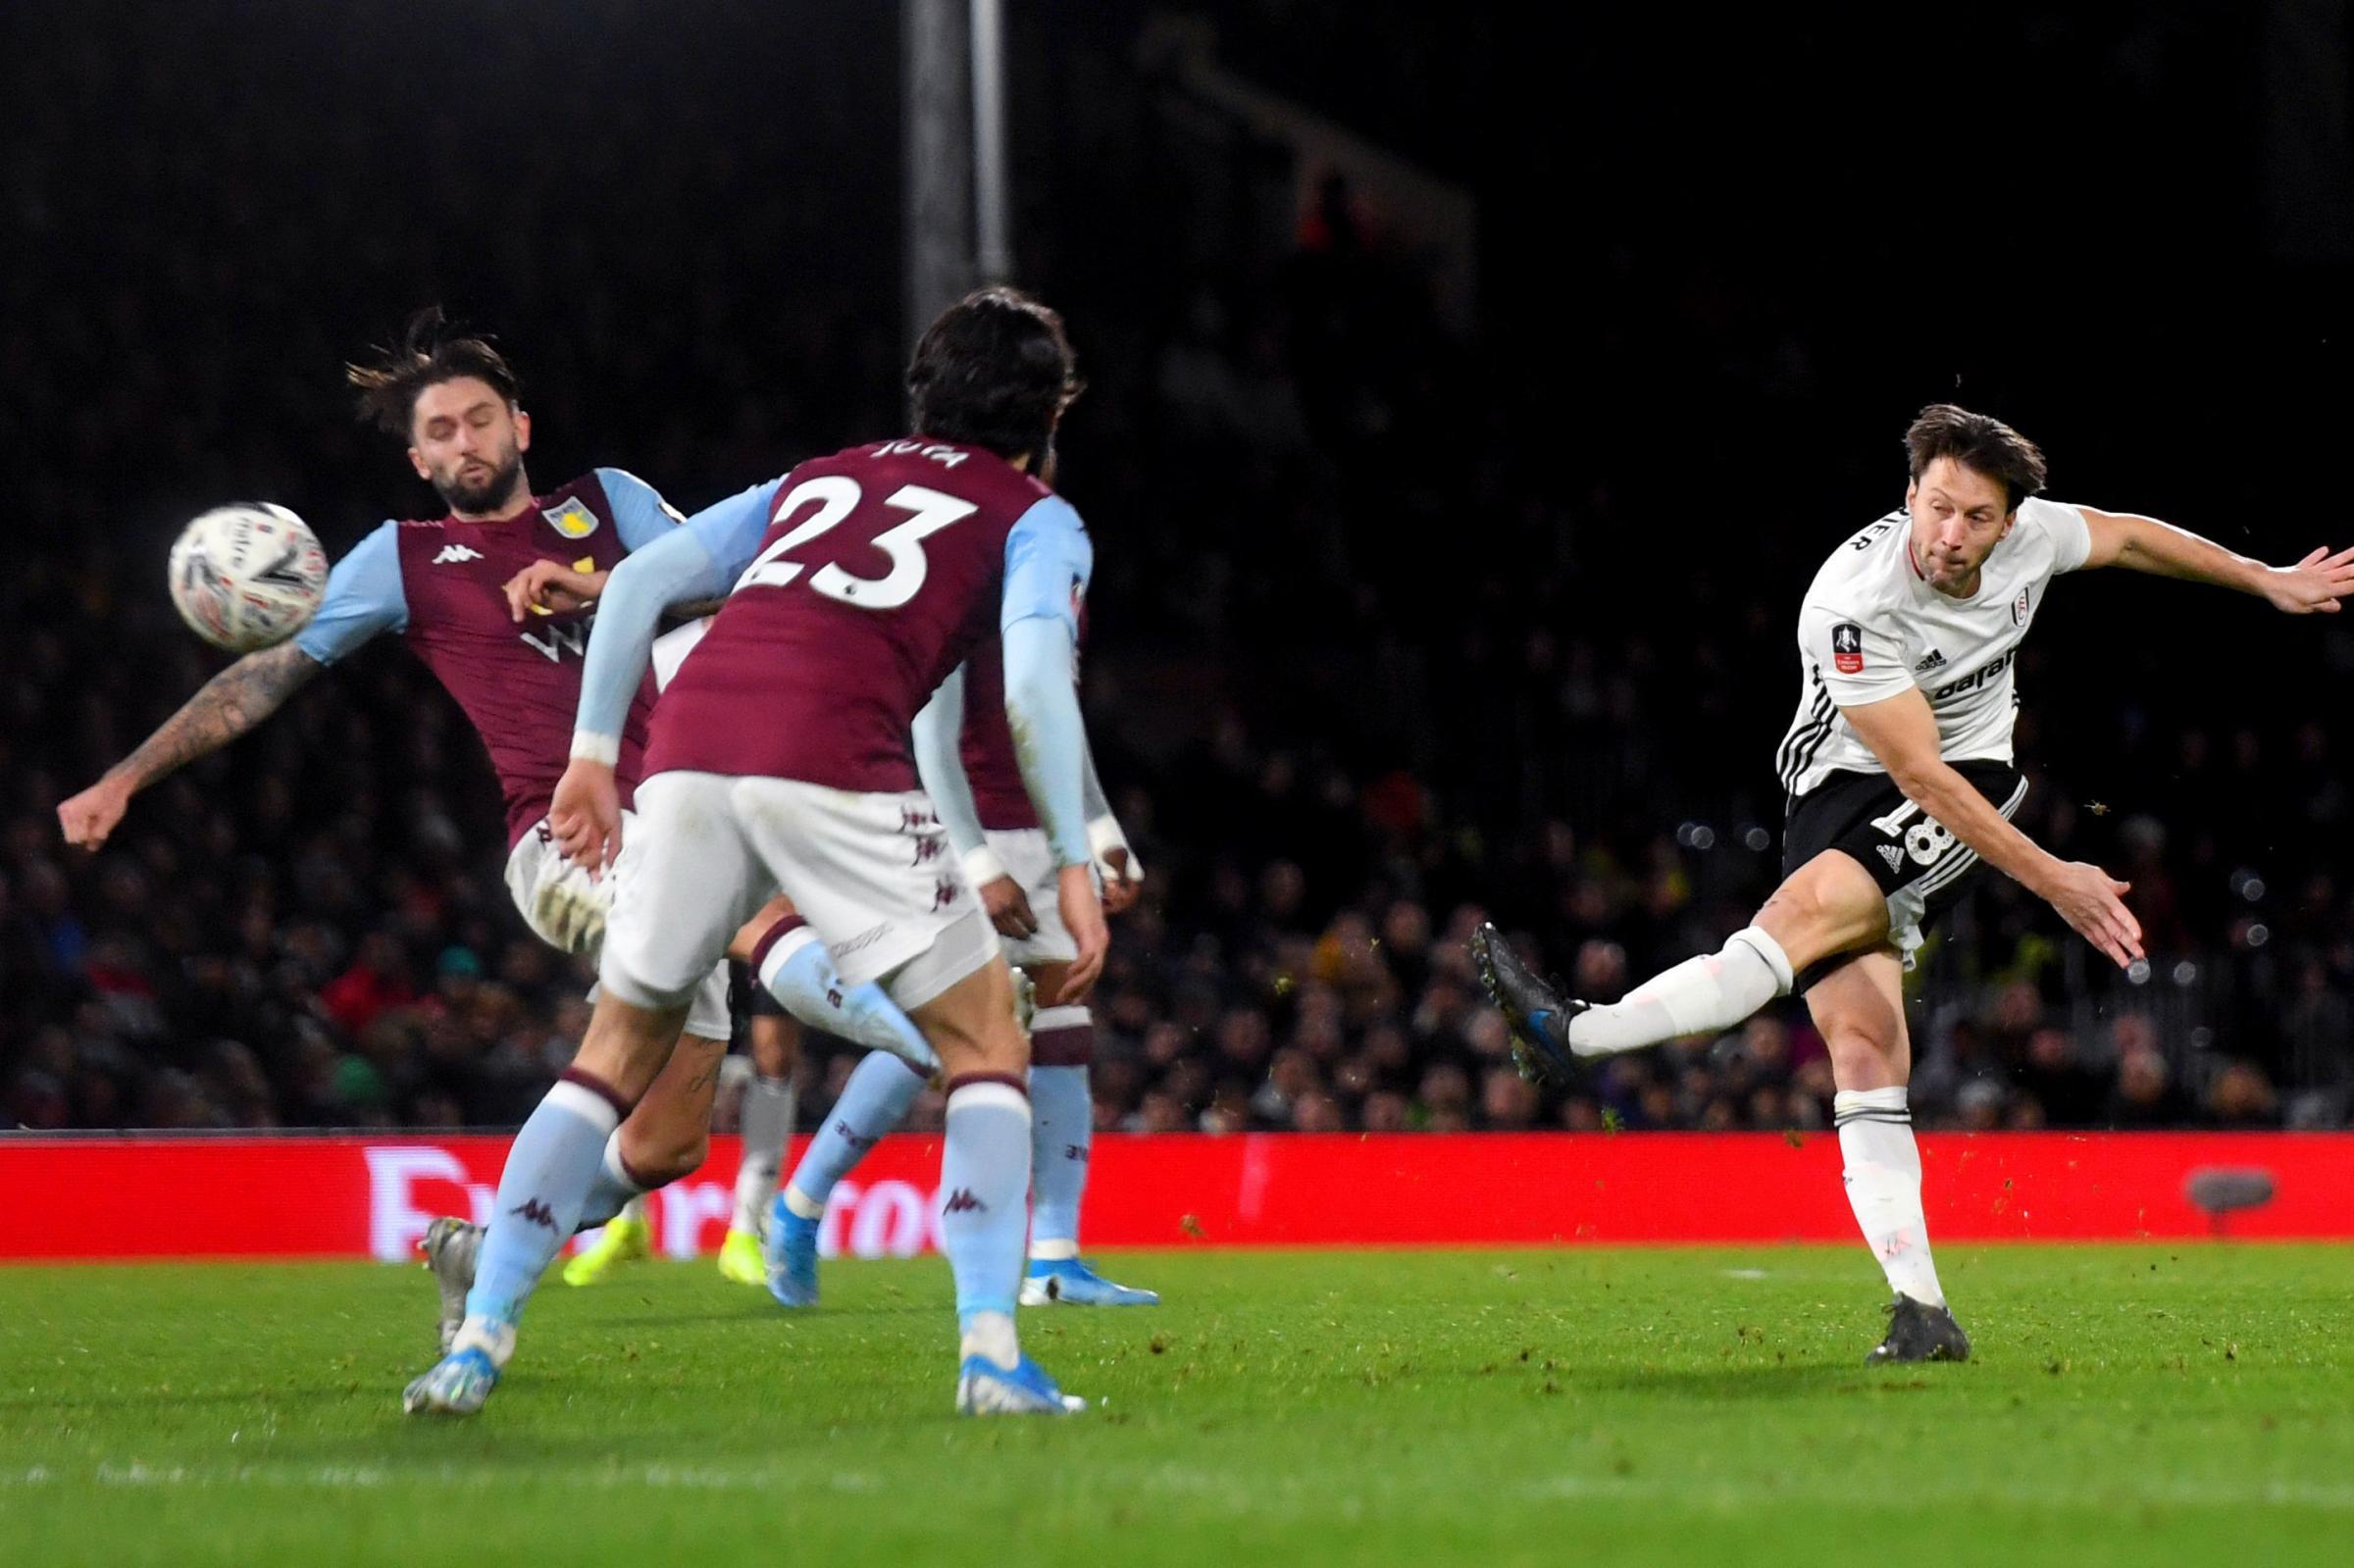 Fulham 'remain keen' on signing Cherries midfielder Arter on permanent deal